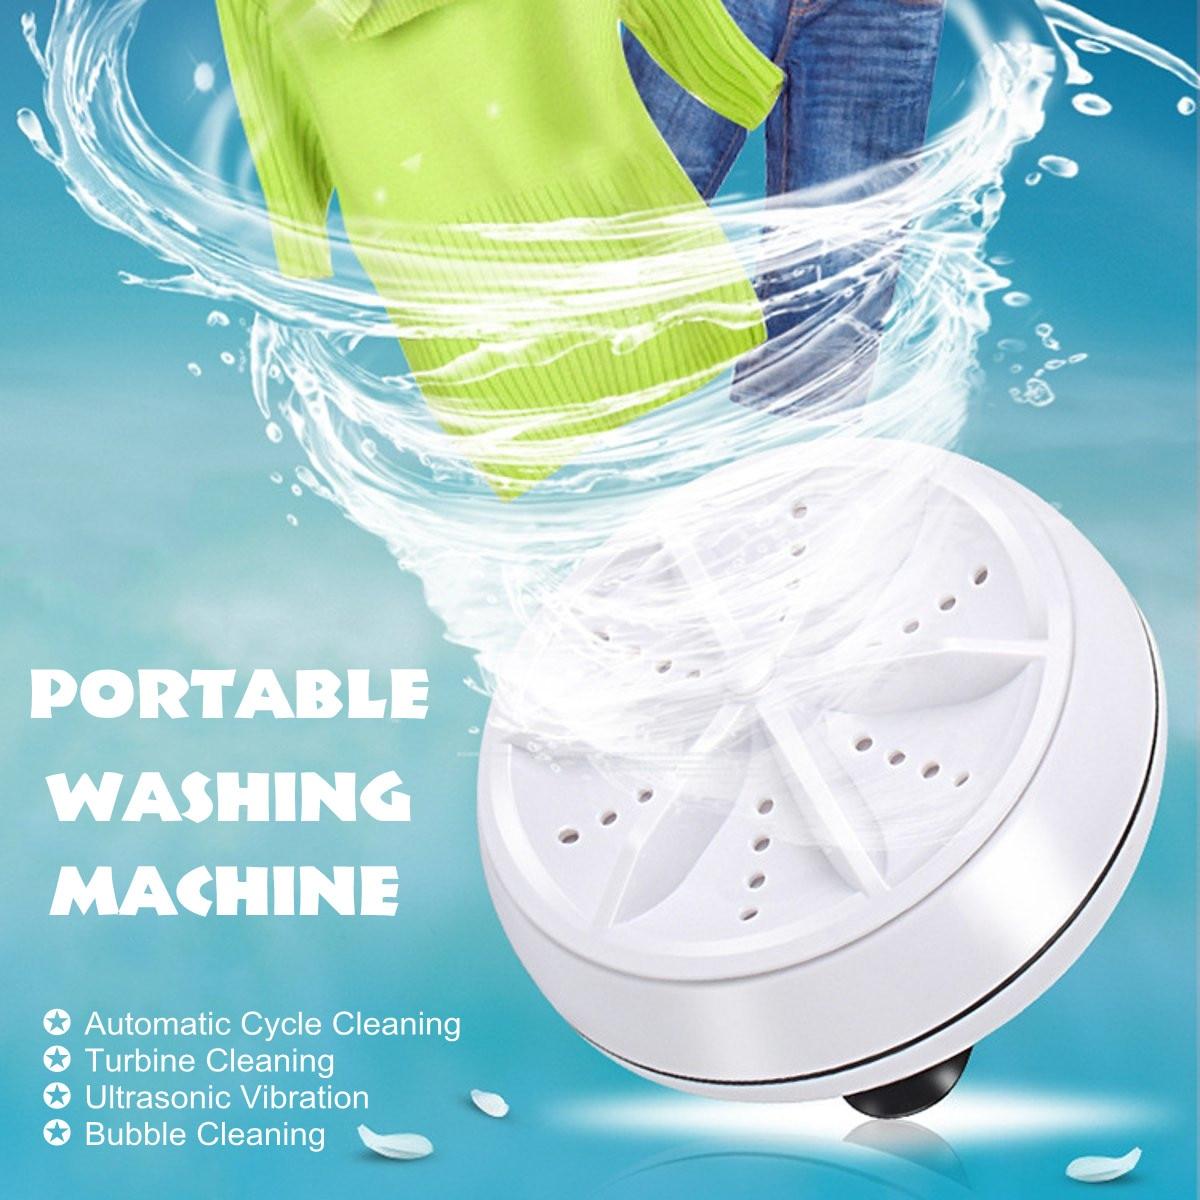 Mini Ultrasonic Washing Machine Portable Turbo Personal Rotating Washer Convenient For Travel Home Business Trip USB 6W 10V